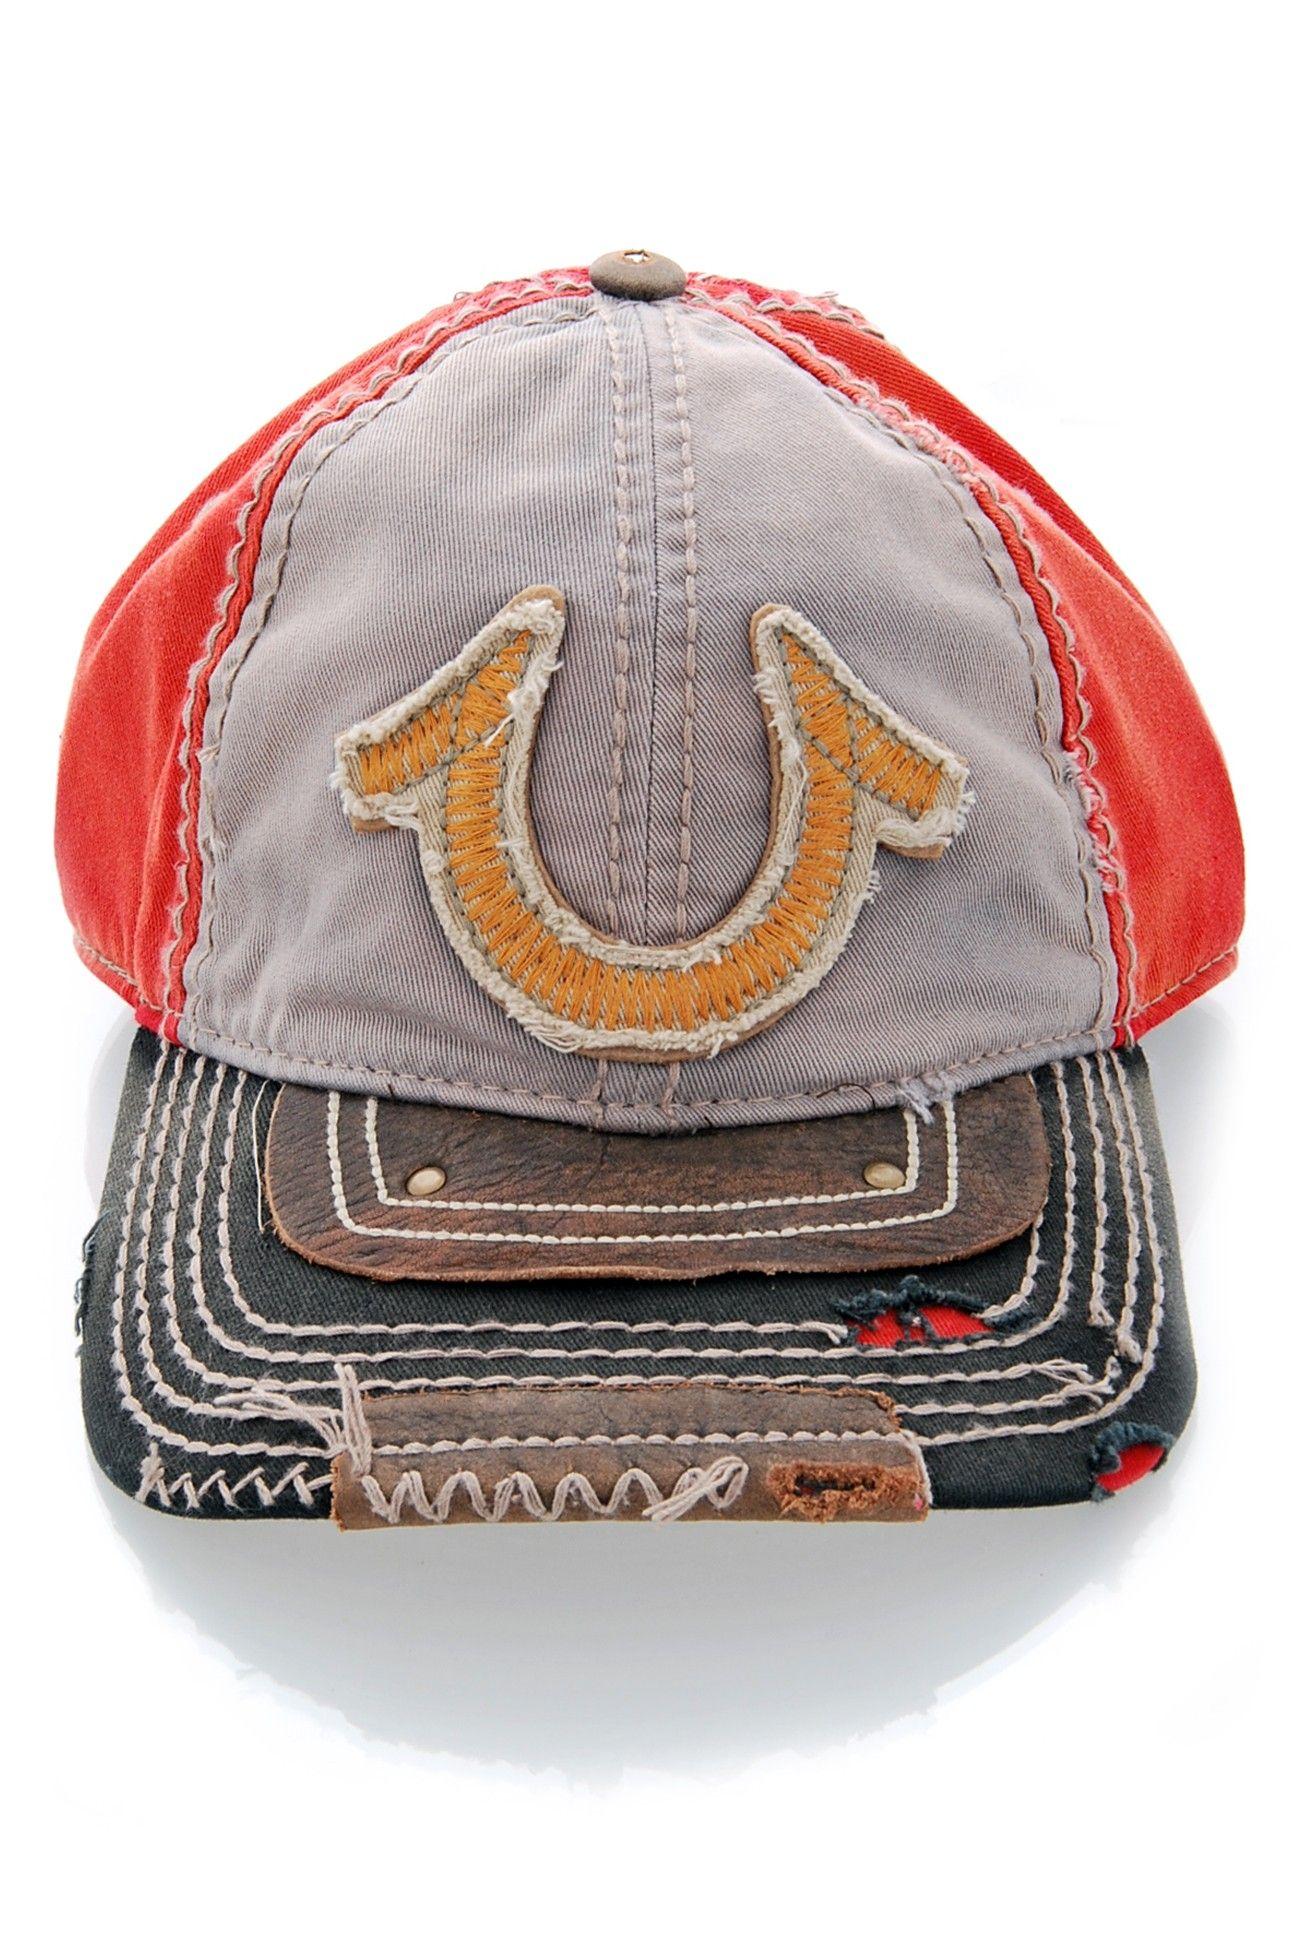 true religion cap men 39 s designer clothing brands hats pinterest cap designers and clothes. Black Bedroom Furniture Sets. Home Design Ideas